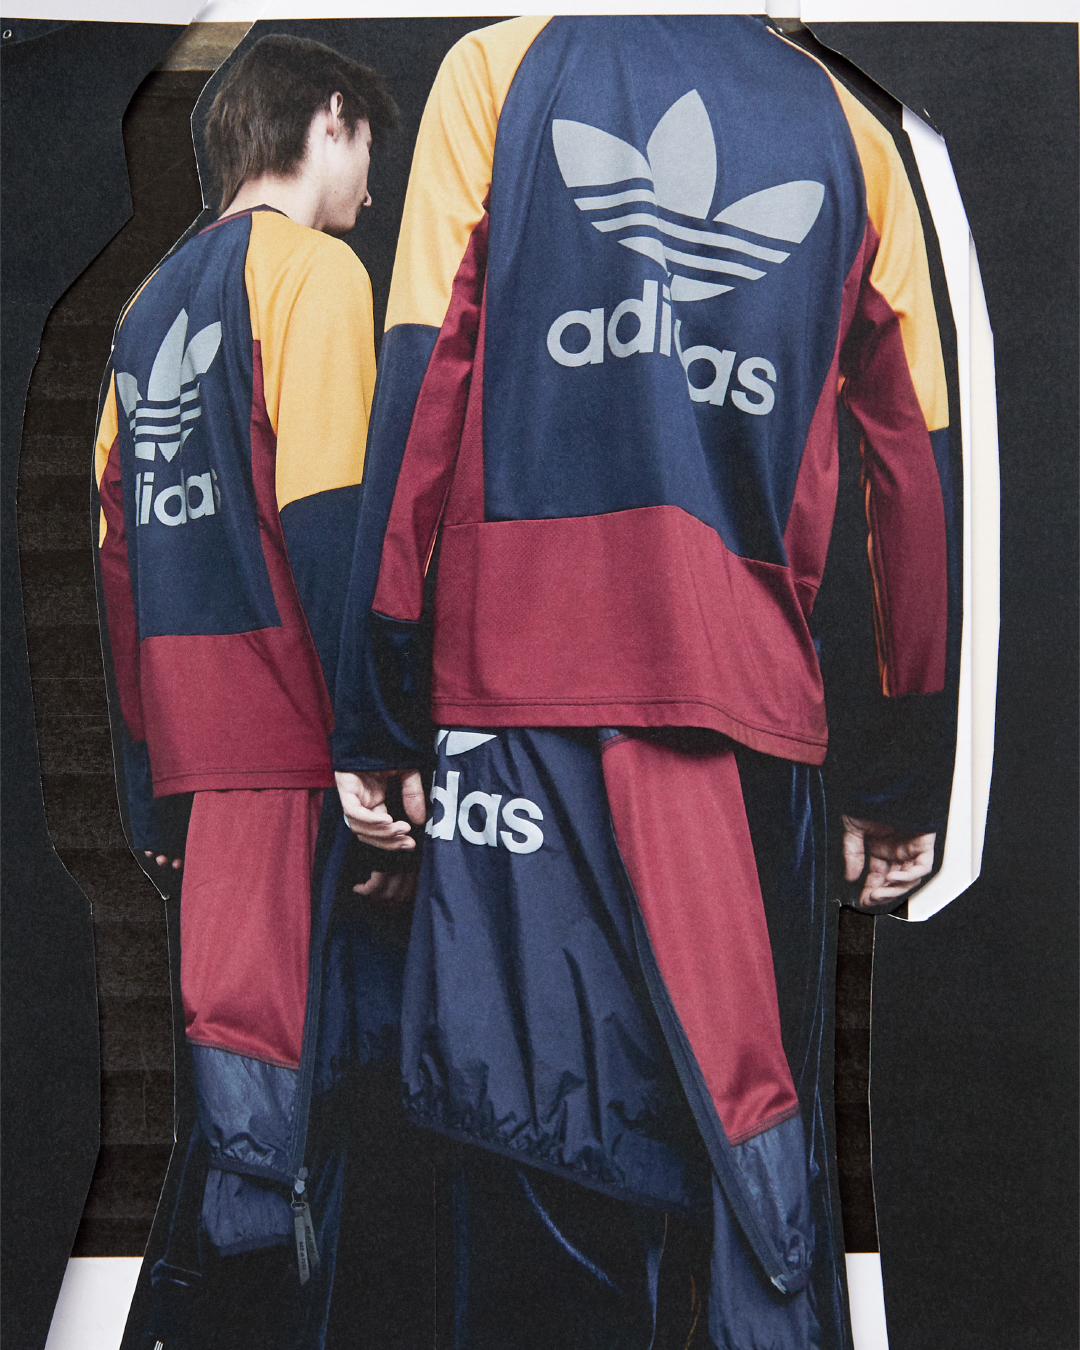 adidas_BedJWFord_Insta_05.jpg